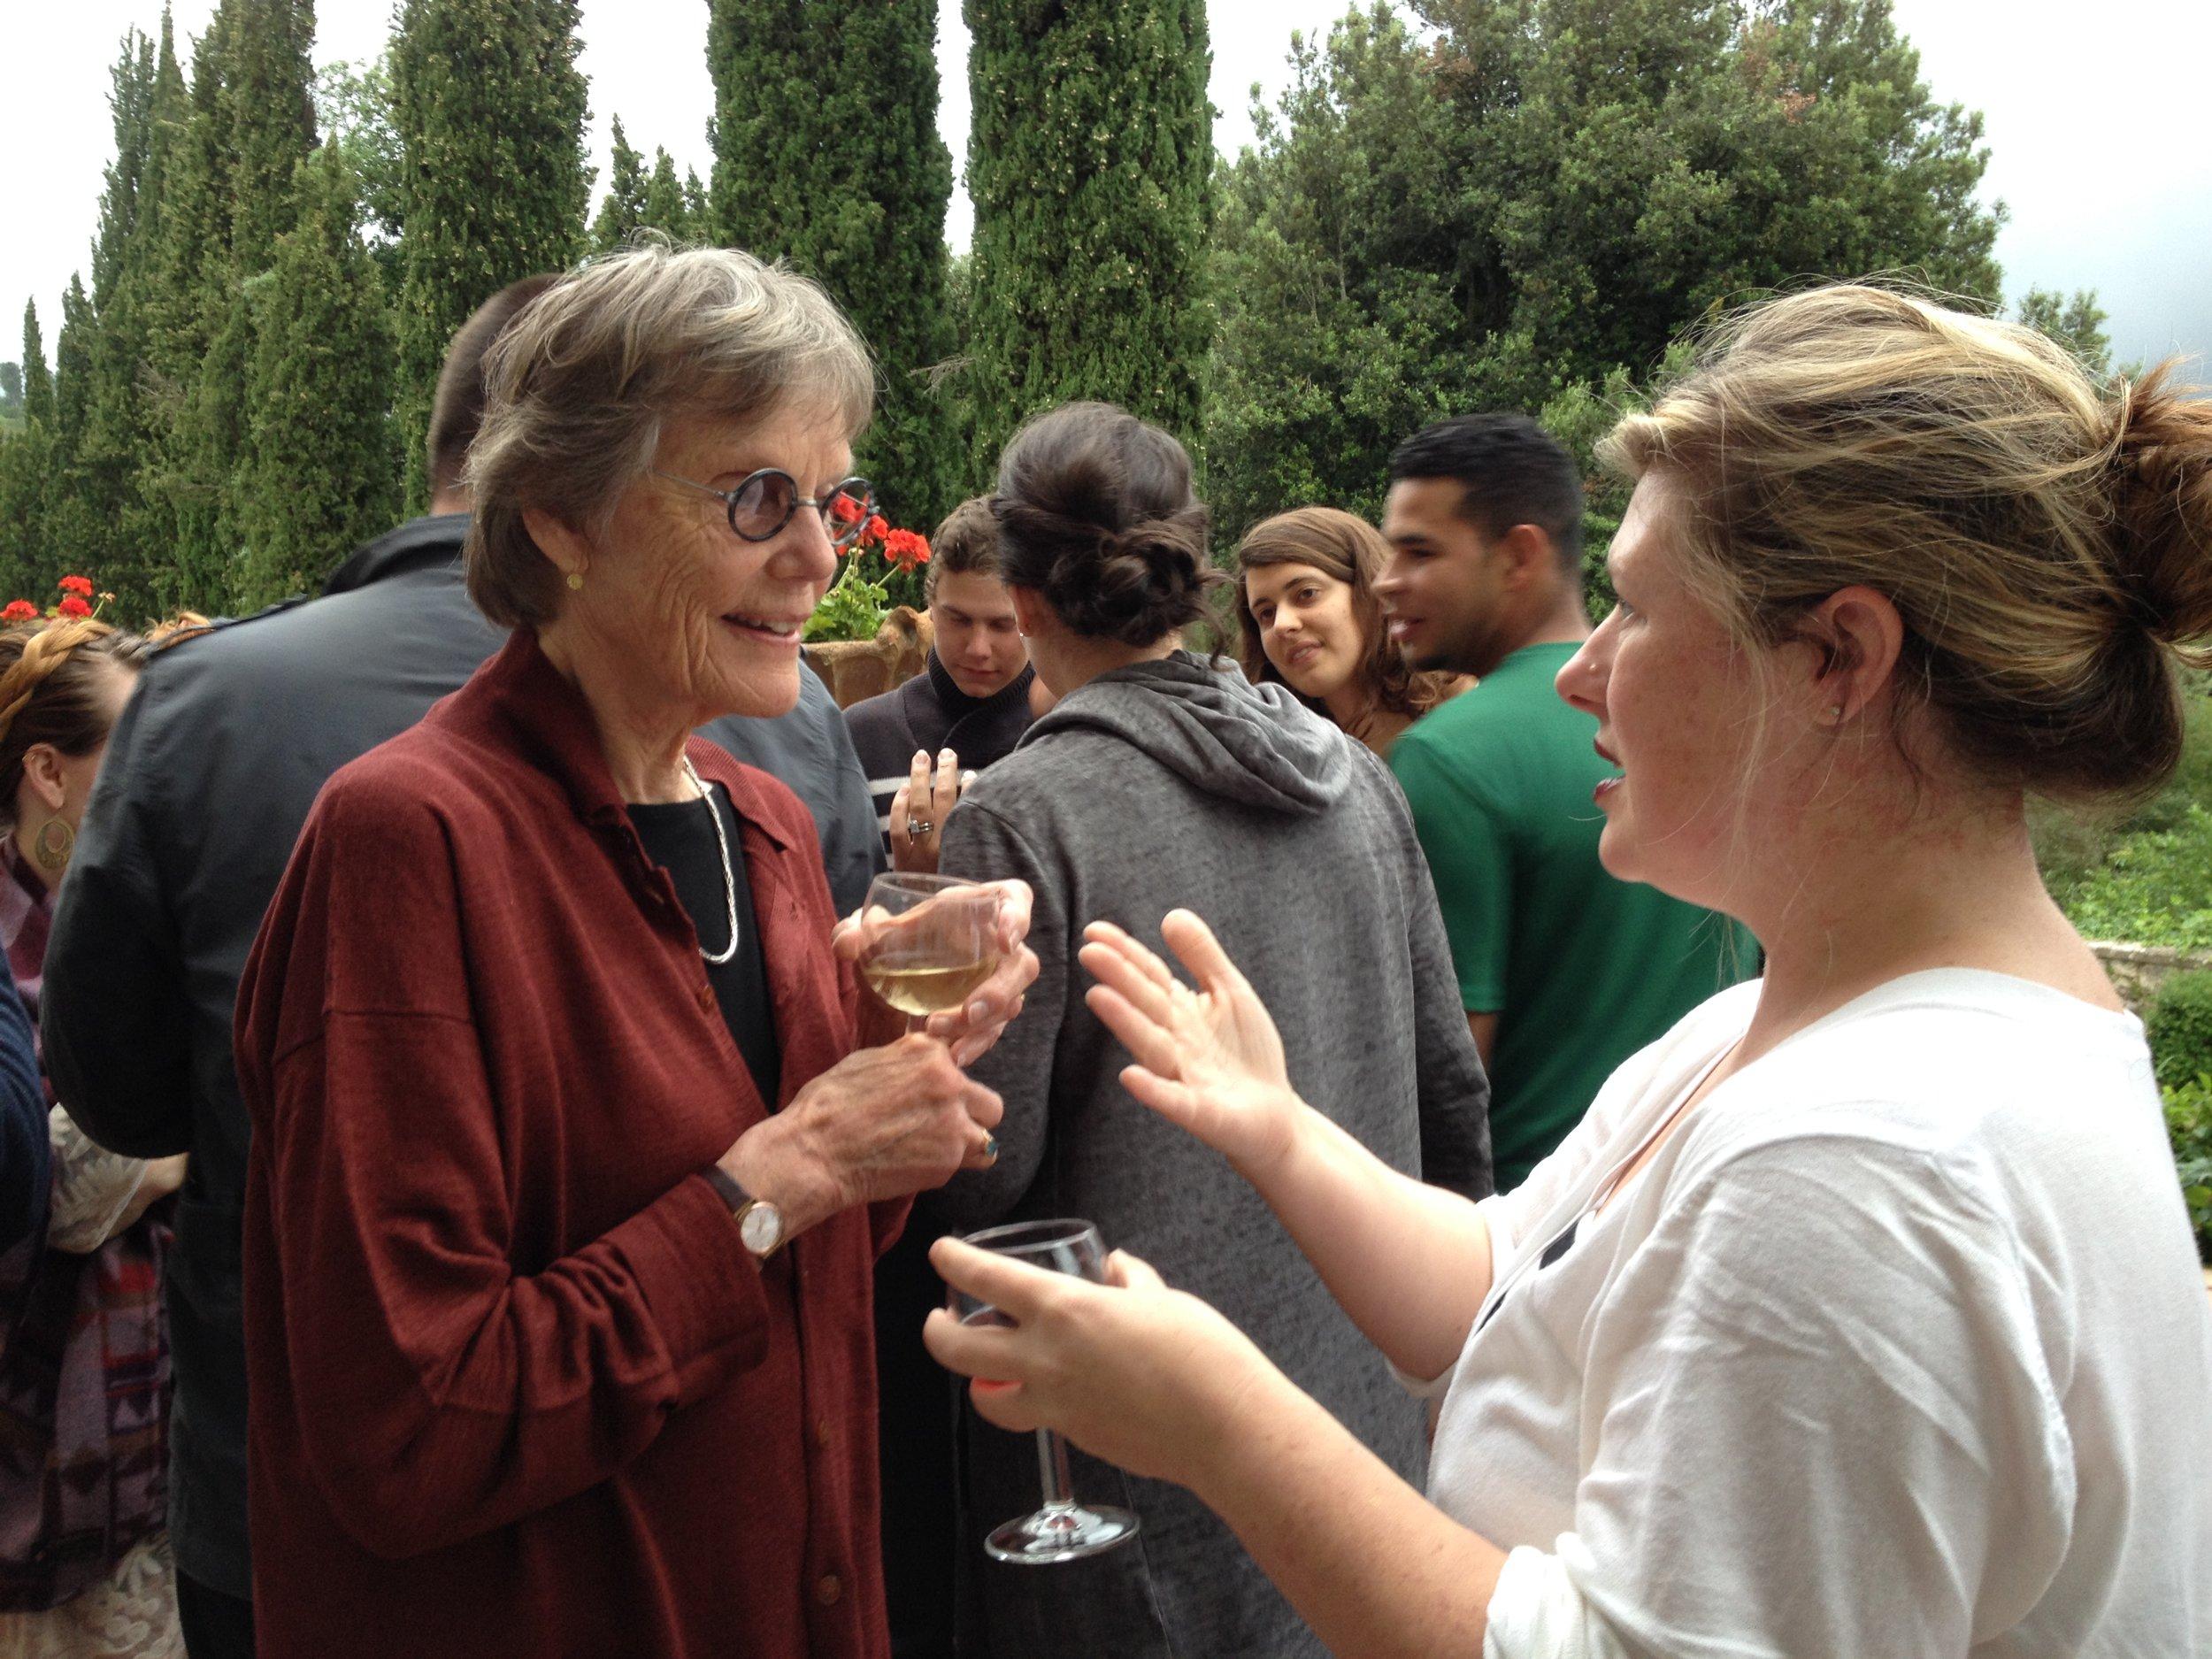 Alison Hildreth at Spannocchia speaking with IDSVA student Lisa Williamson. Photo by Simonetta Moro